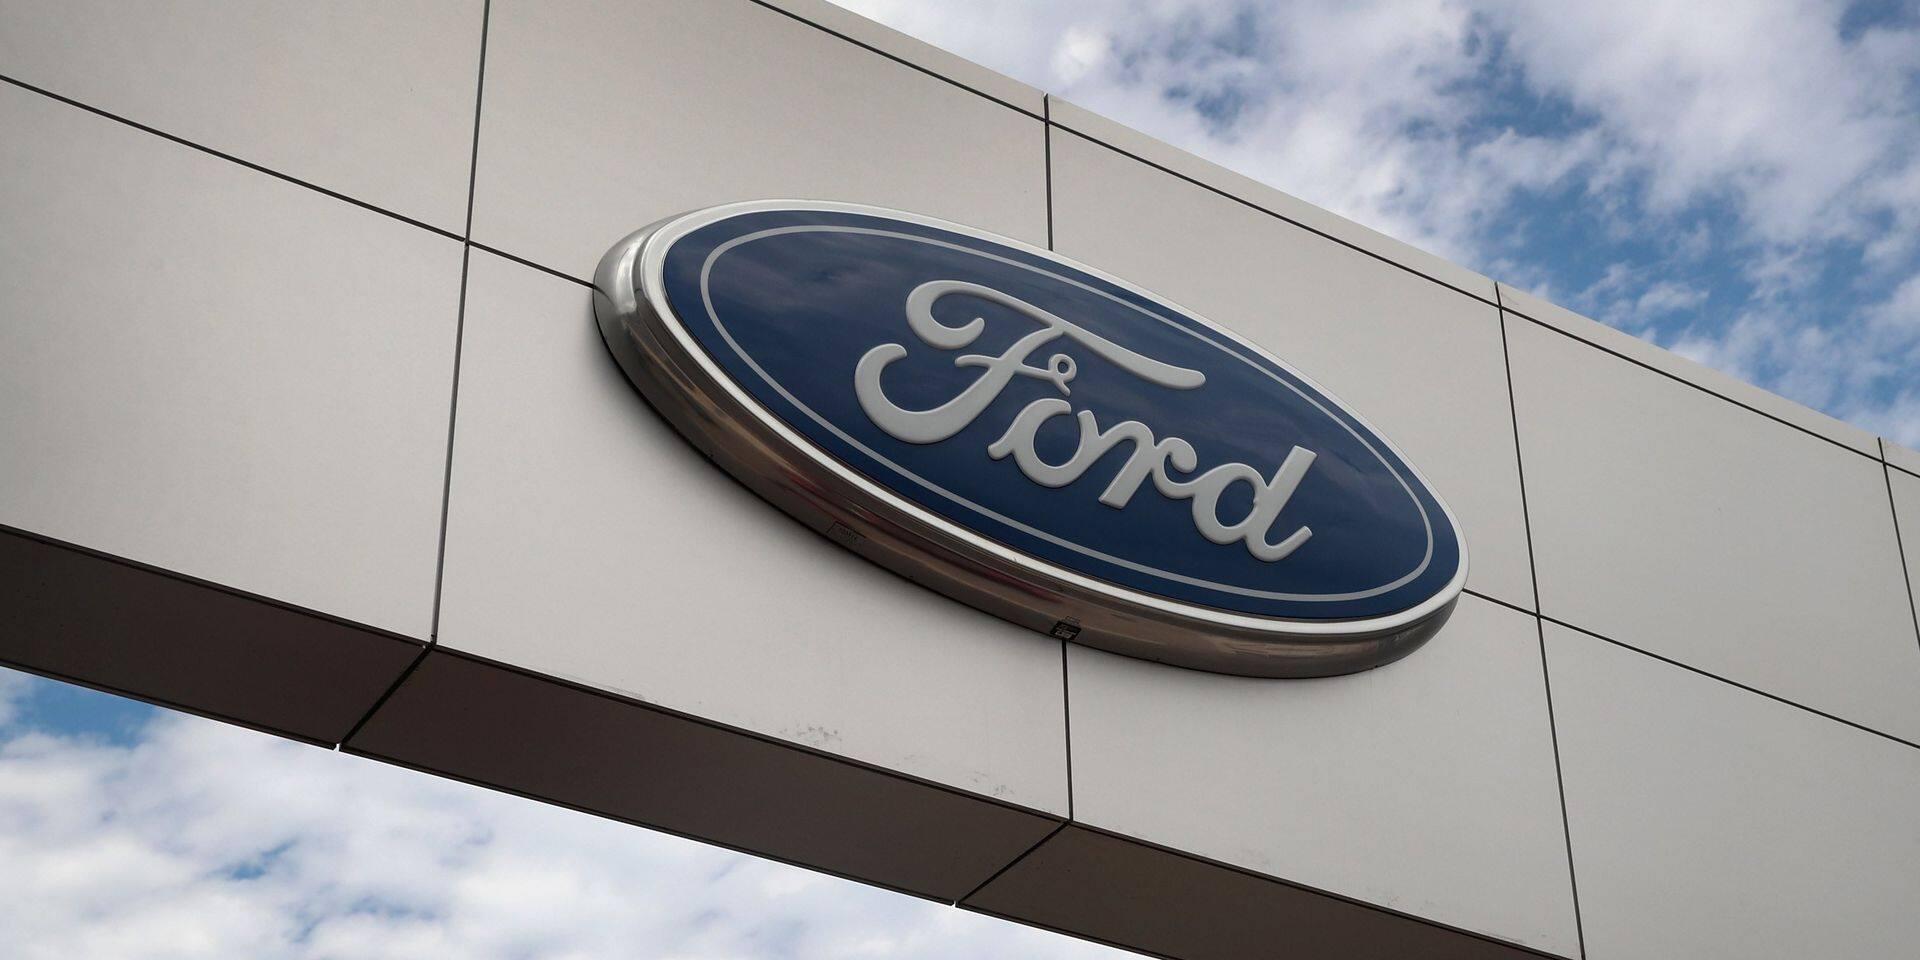 Ford et JLR tapent dans l'emploi